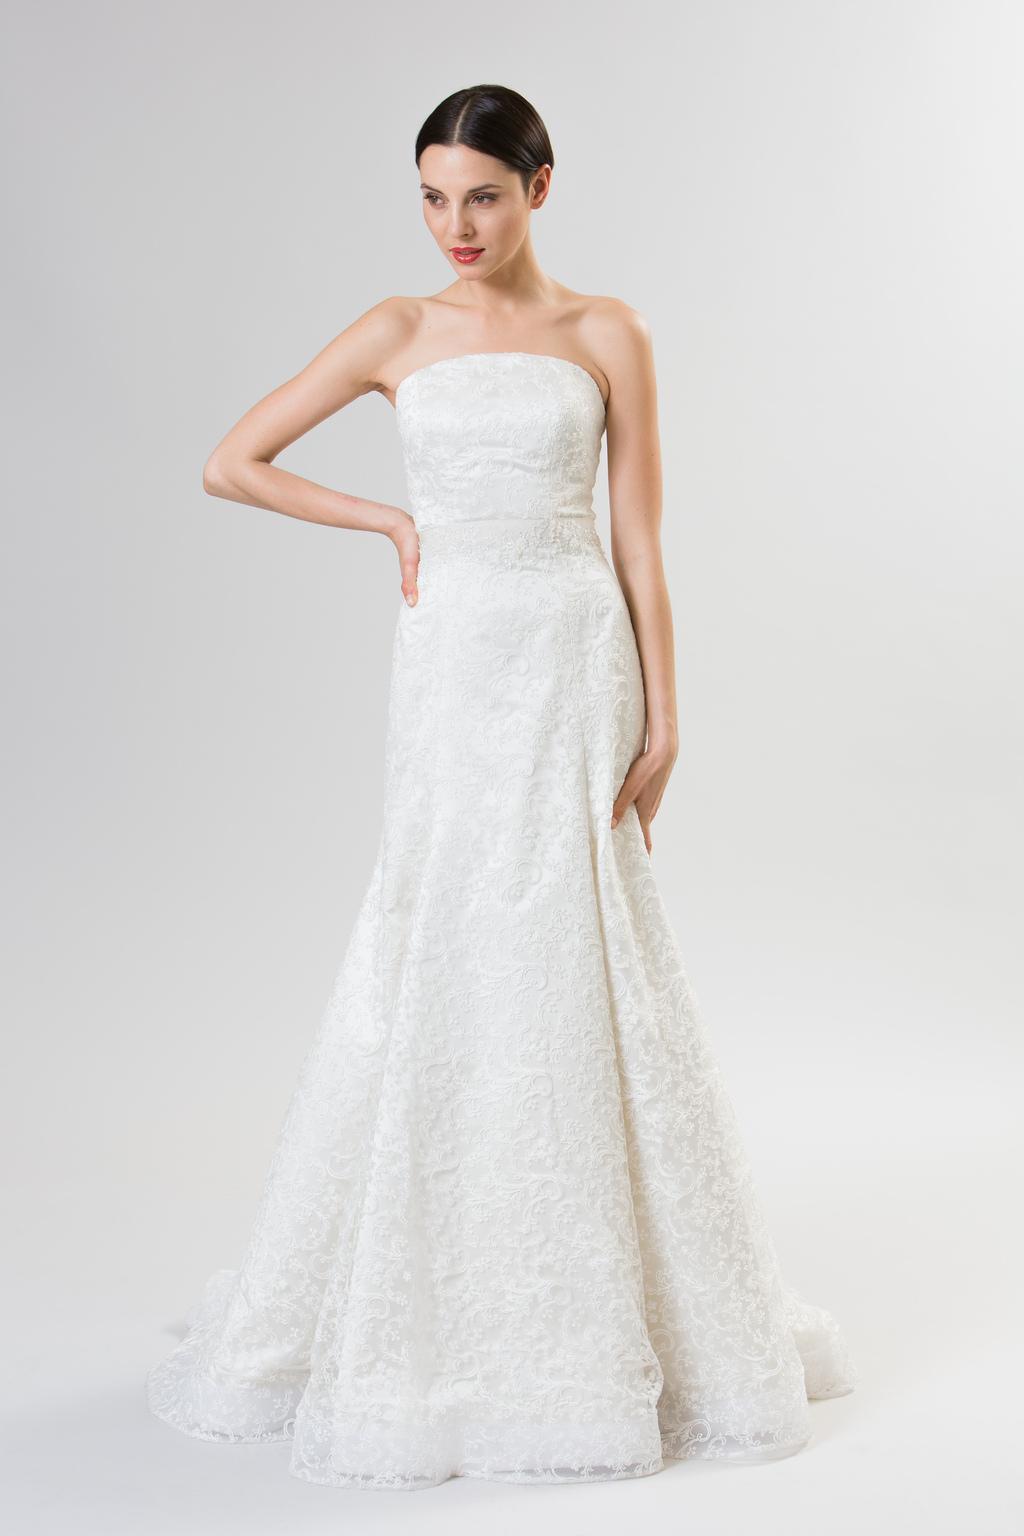 Junko-yoshioka-summer-spring-2014-wedding-dress-suzette_1.full